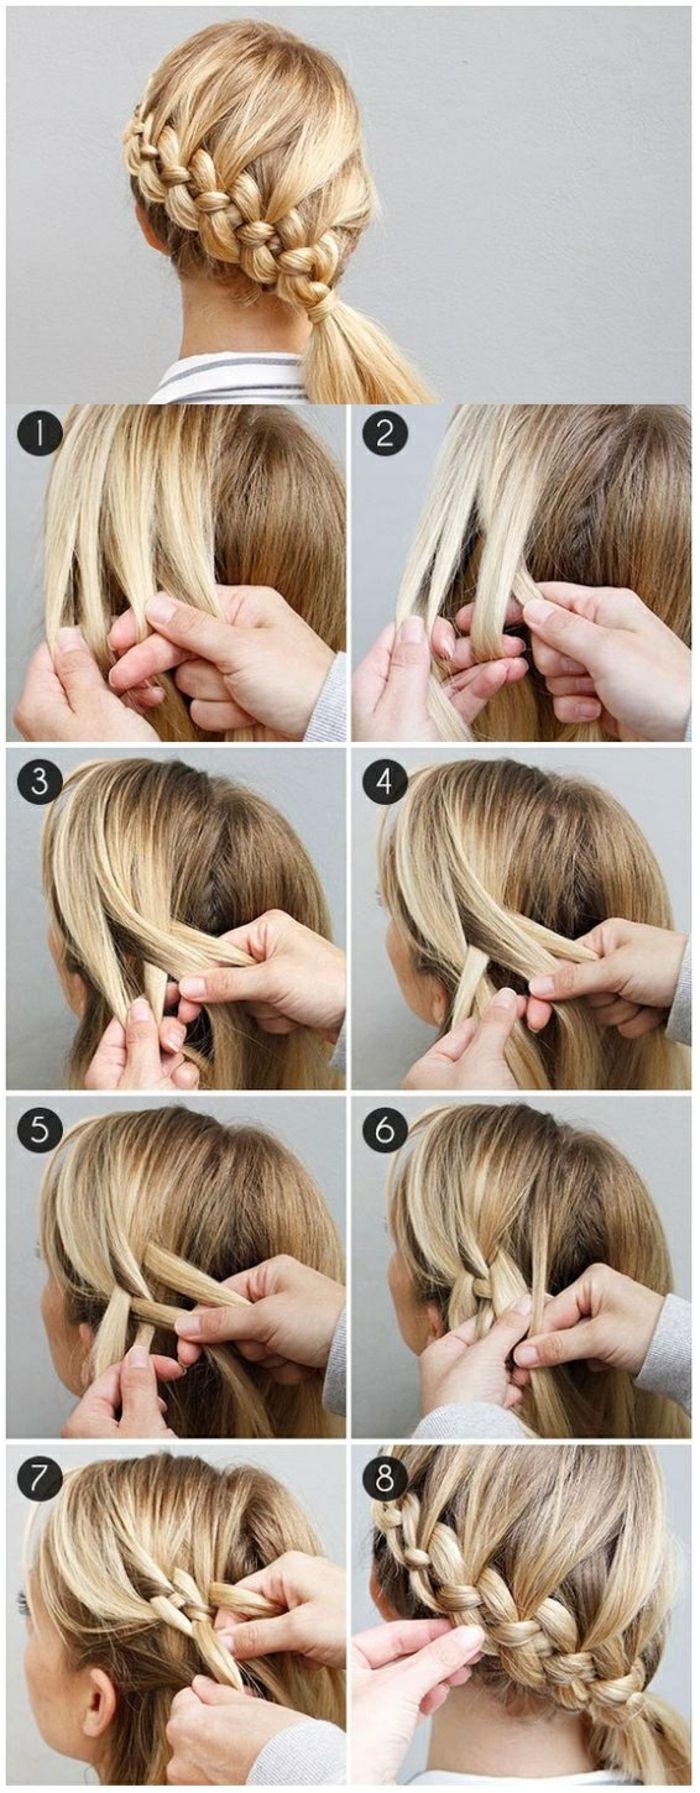 Flechtfrisuren Selber Machen Mittellange Blonde Haare Flechten